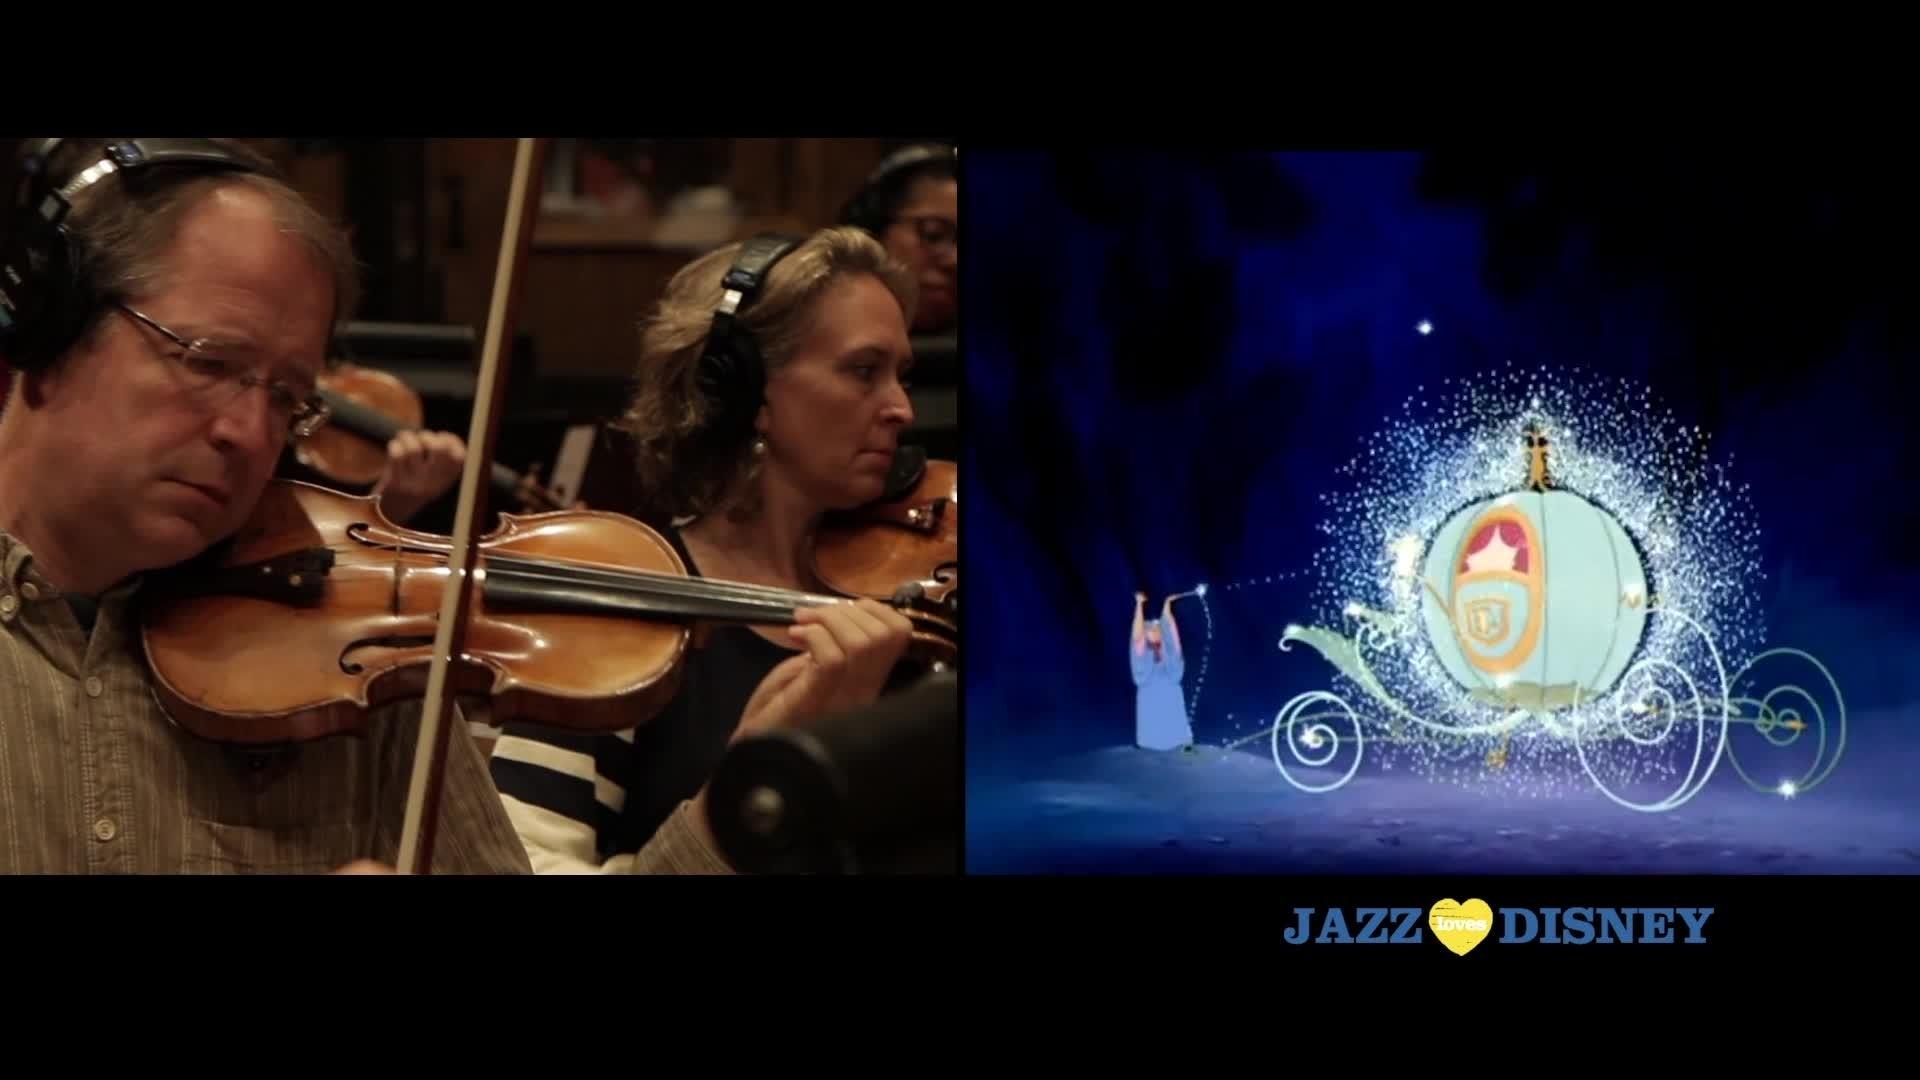 Jazz Loves Disney - 2nd trailer